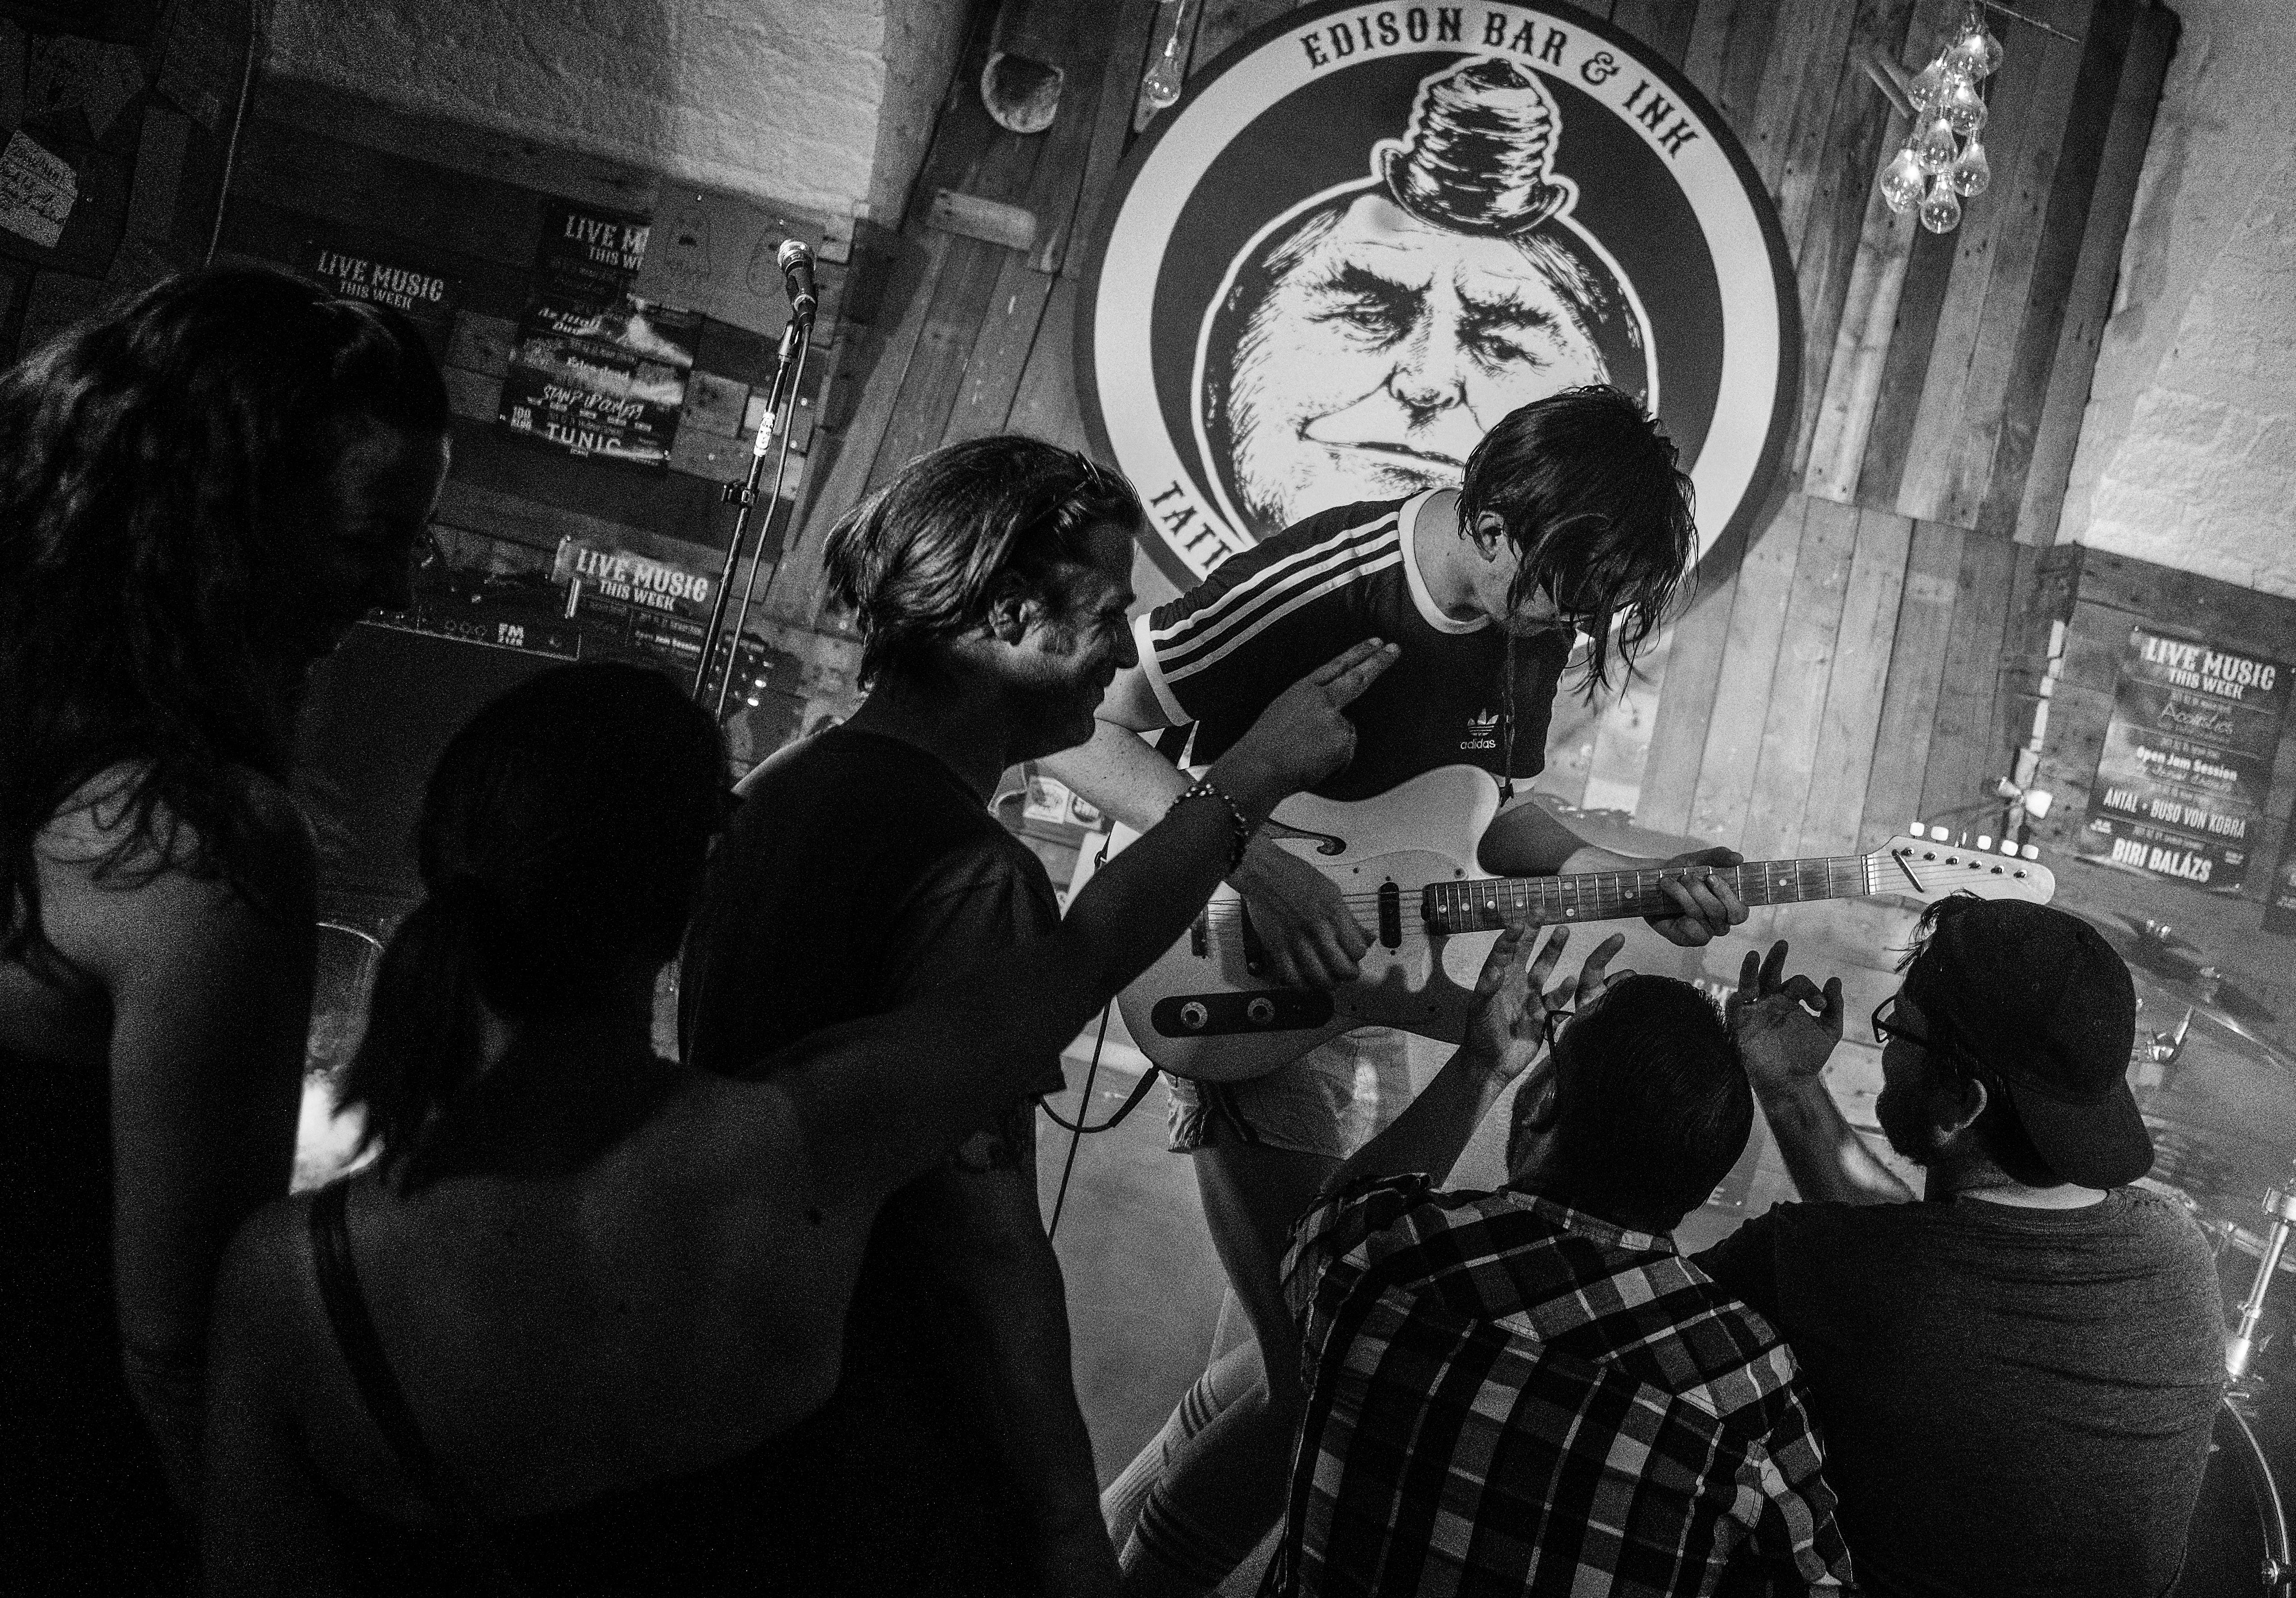 Teddy Harpo koncert Edison Bar Budapest